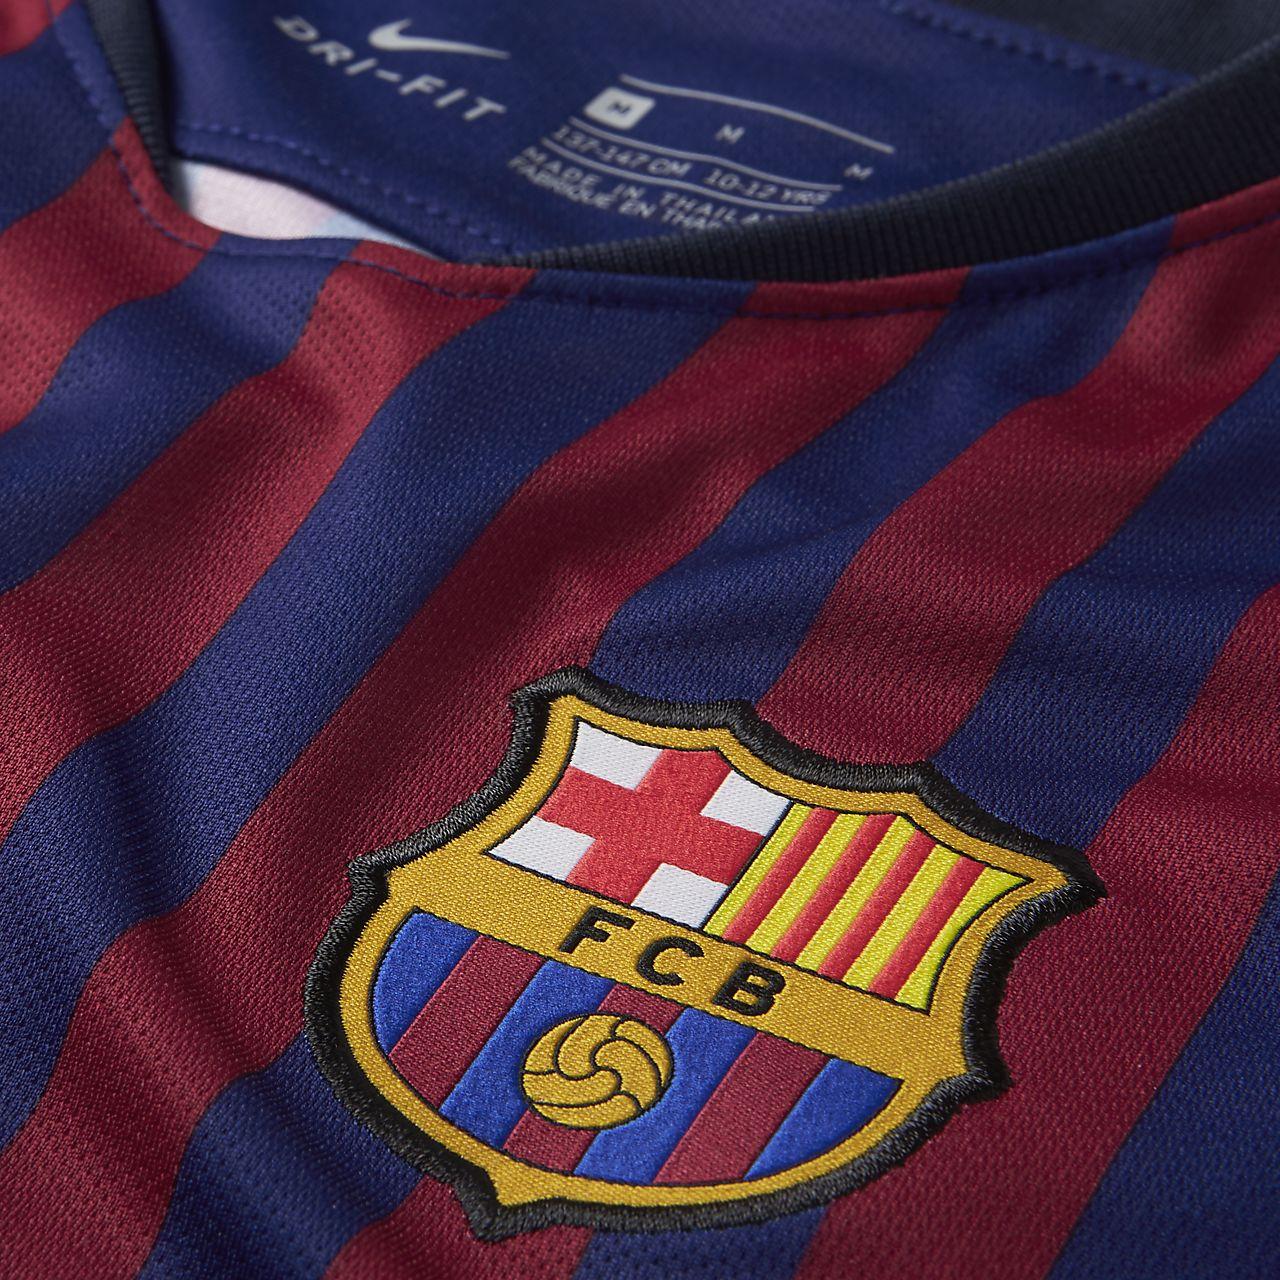 ecf369c9 2018/19 FC Barcelona Stadium Home Big Kids' Soccer Jersey. Nike.com